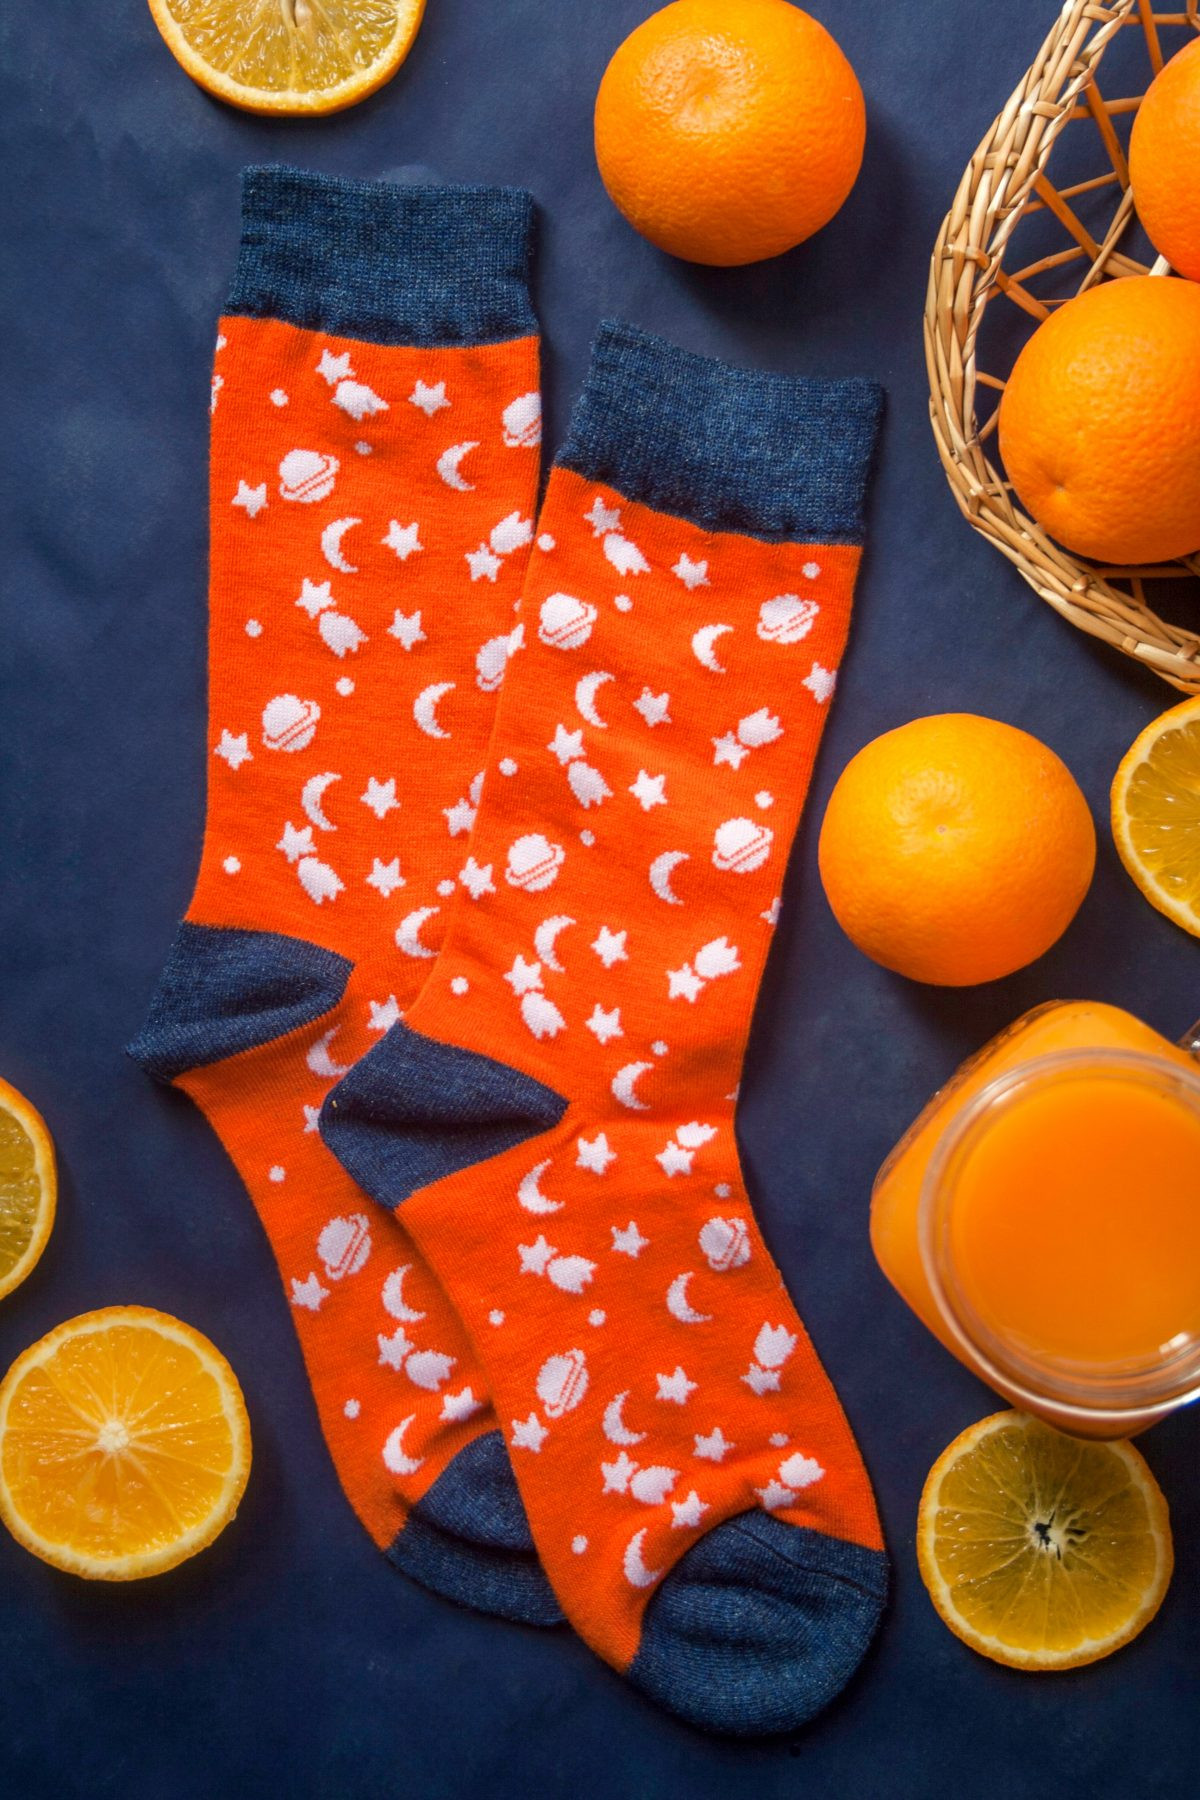 جوراب ساق دار کهکشان نارنجی